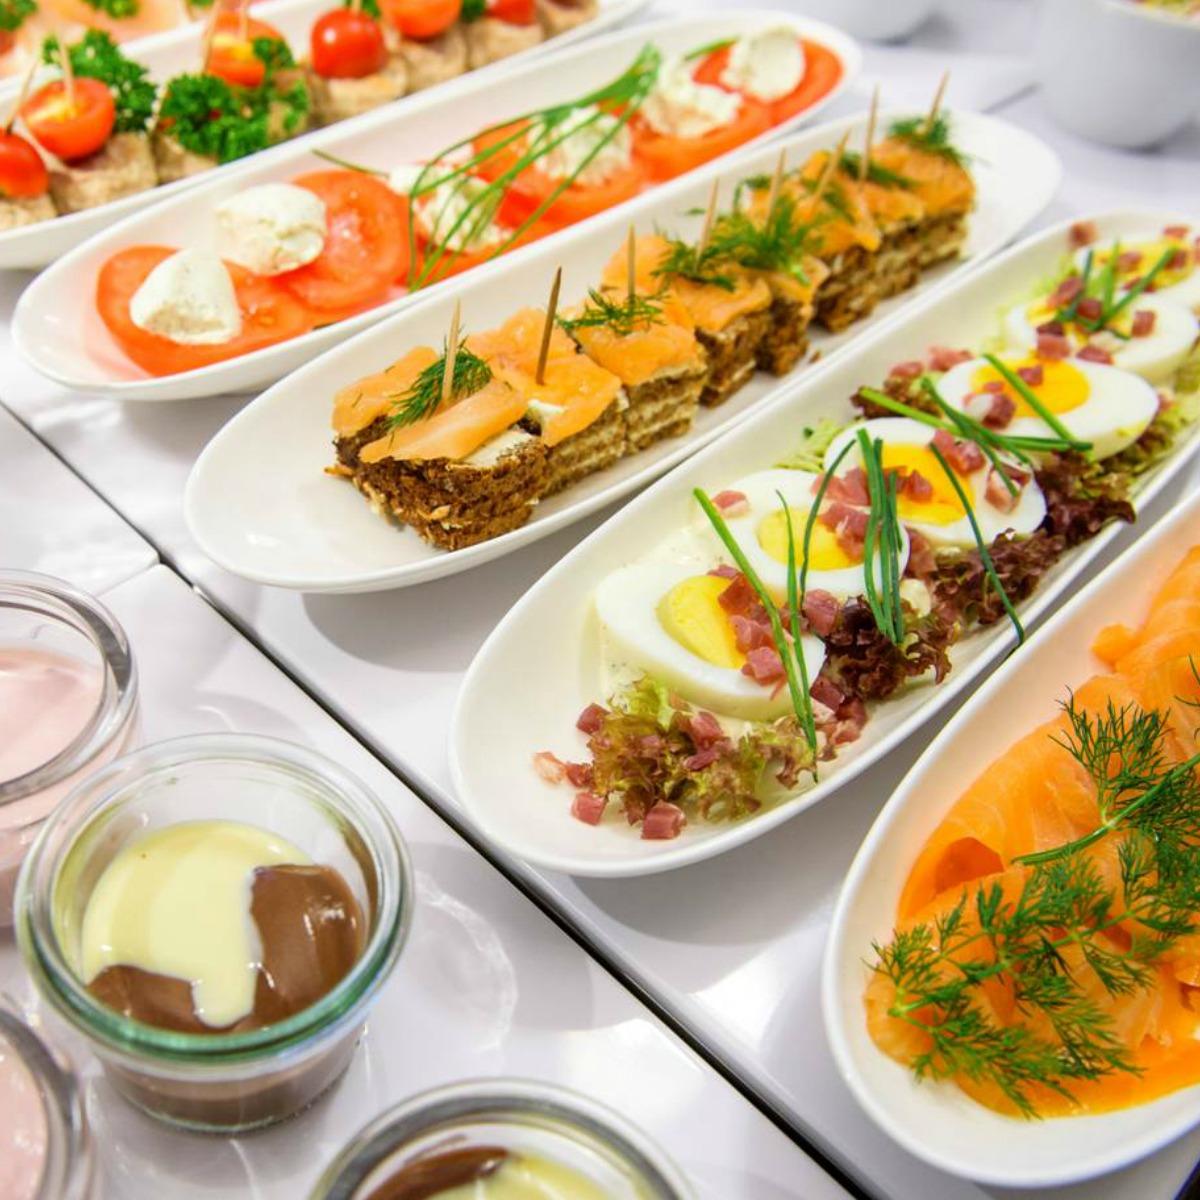 Hotel Einzigartig Lüneburg Frühstücksbuffet